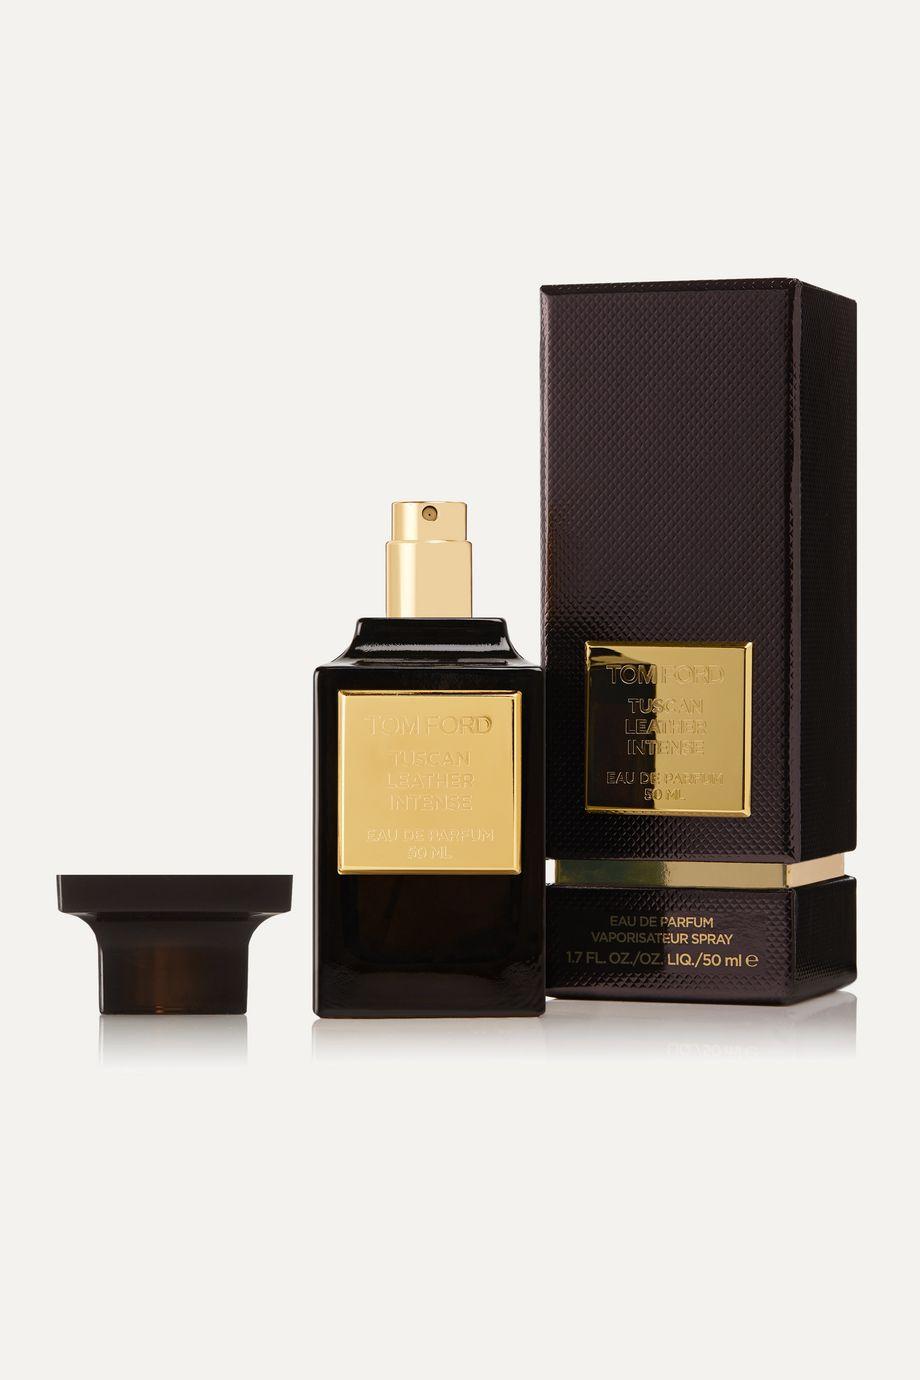 TOM FORD BEAUTY Tuscan Leather Intense Eau de Parfum, 50ml